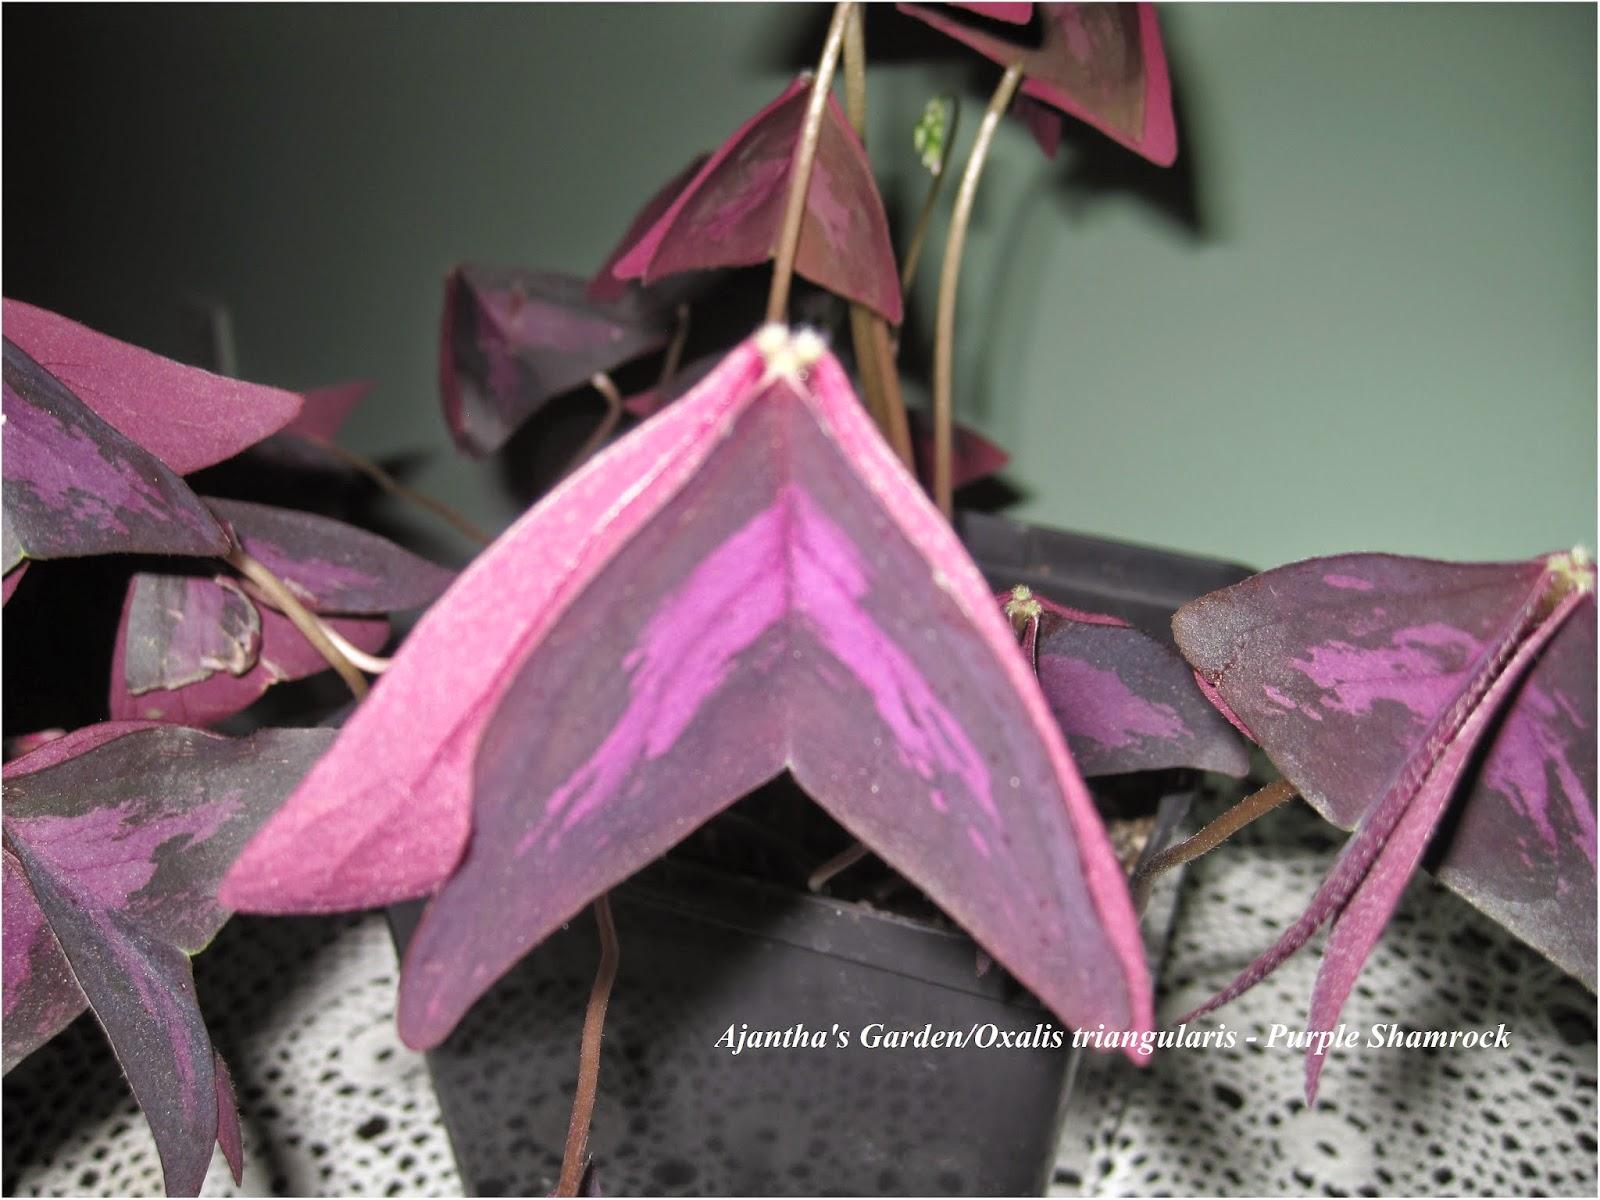 Oxalic triangularis - Purple Shamrock